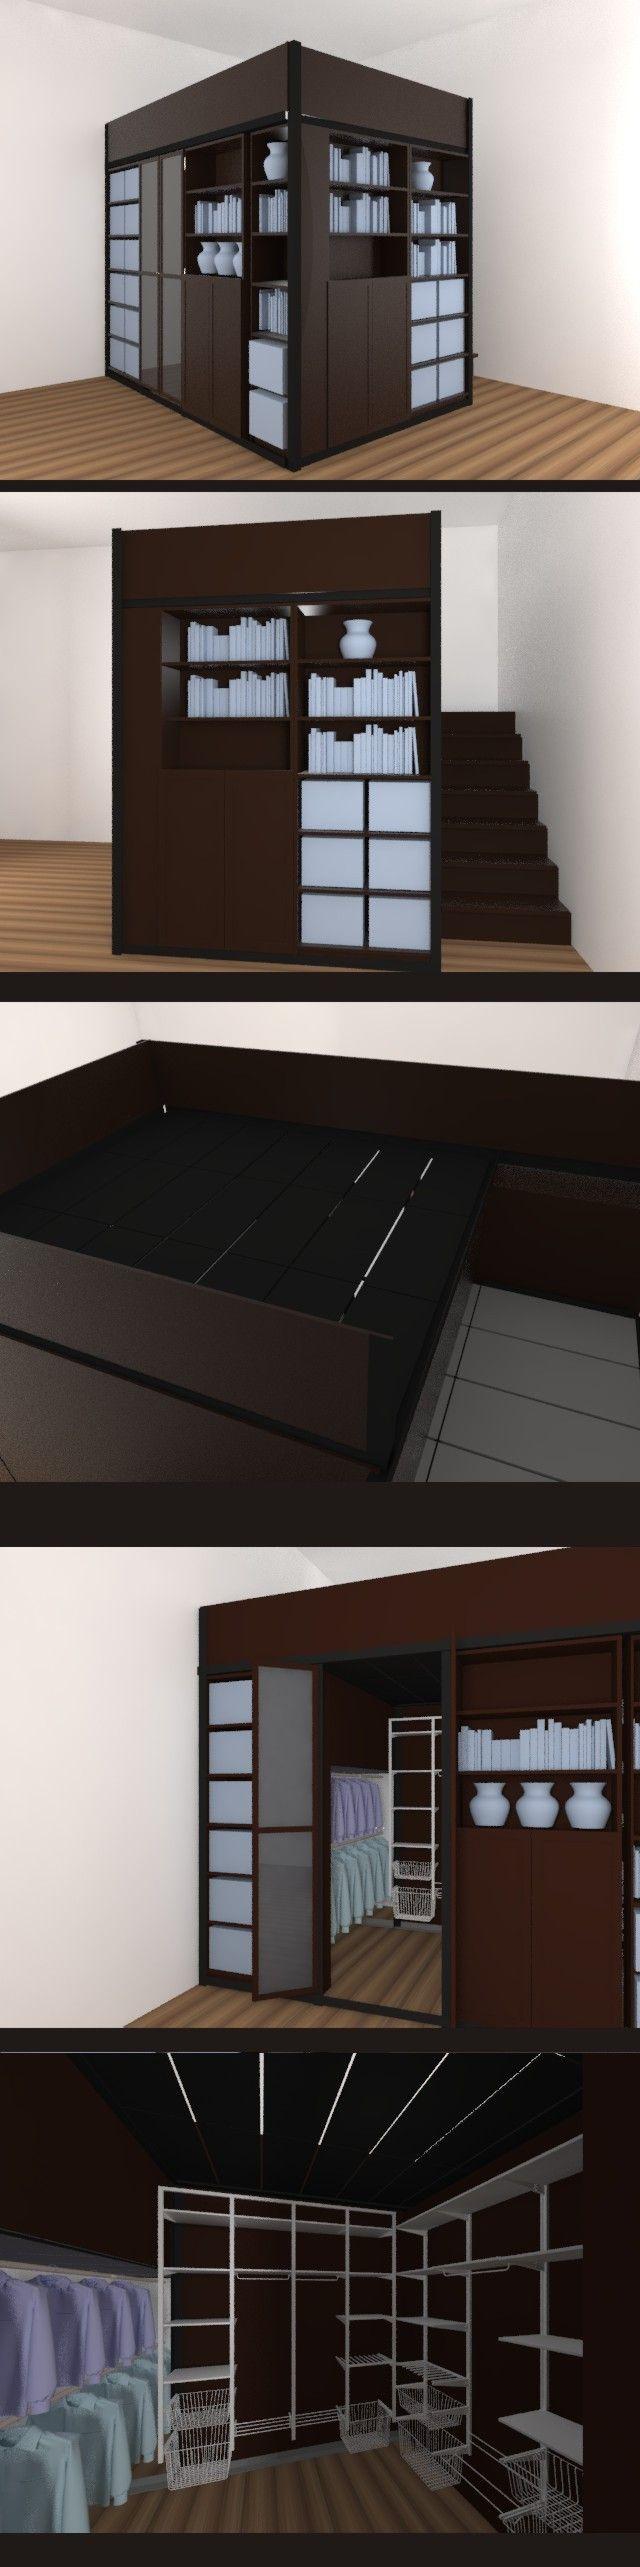 LOFT IDEA IKEA BULLY furniture 4 m2 gardrobe + bed